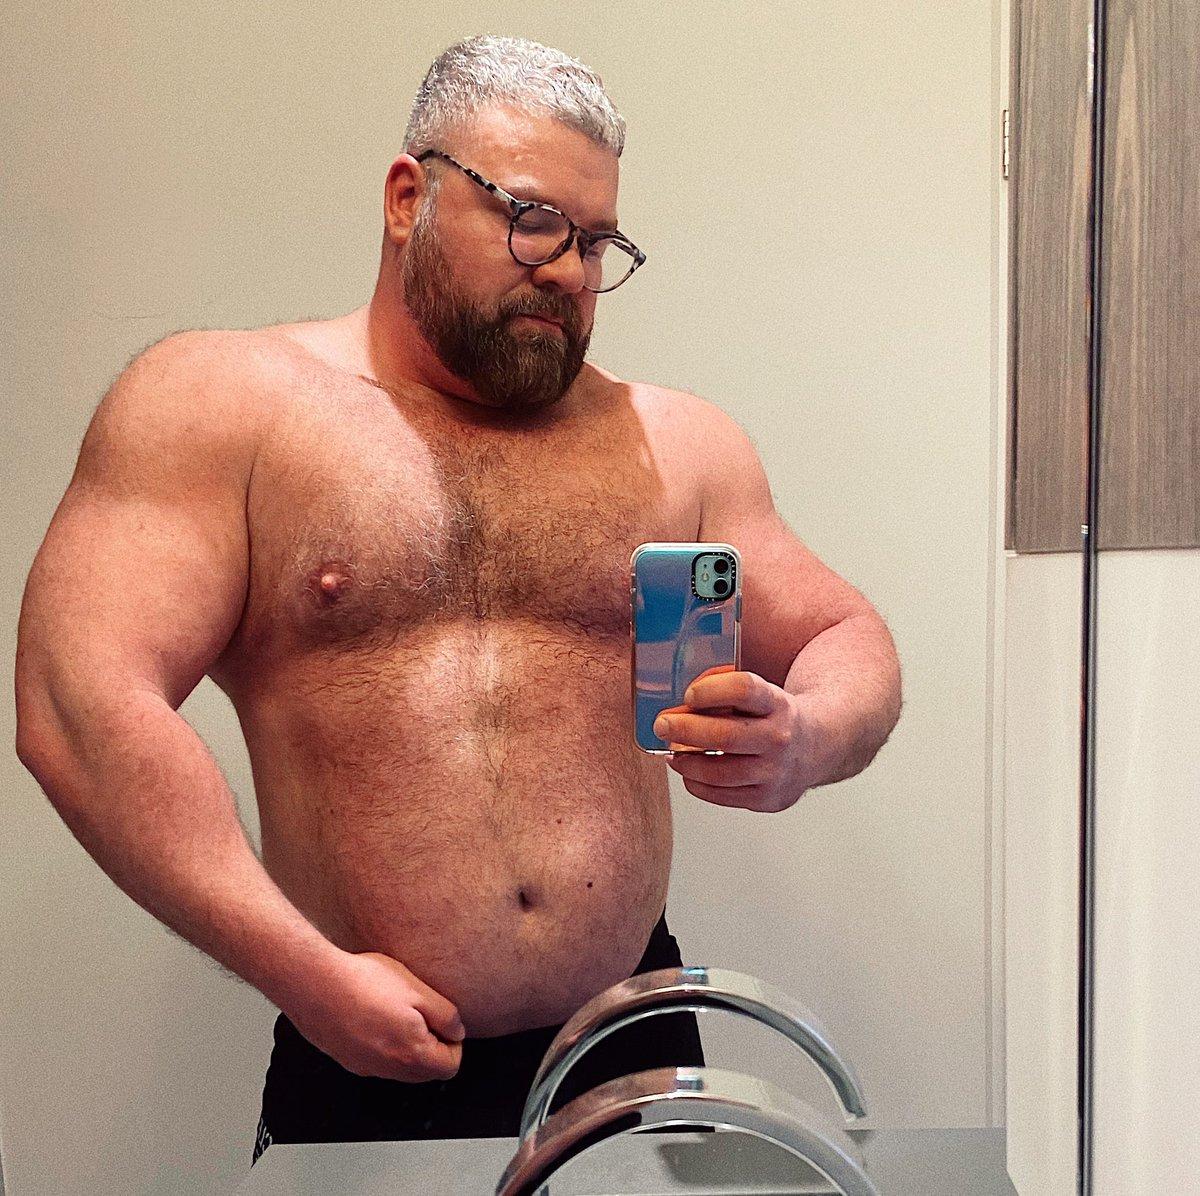 Do I have abs yet? #fatfriday #flexfriday <br>http://pic.twitter.com/DBGshkCbeM